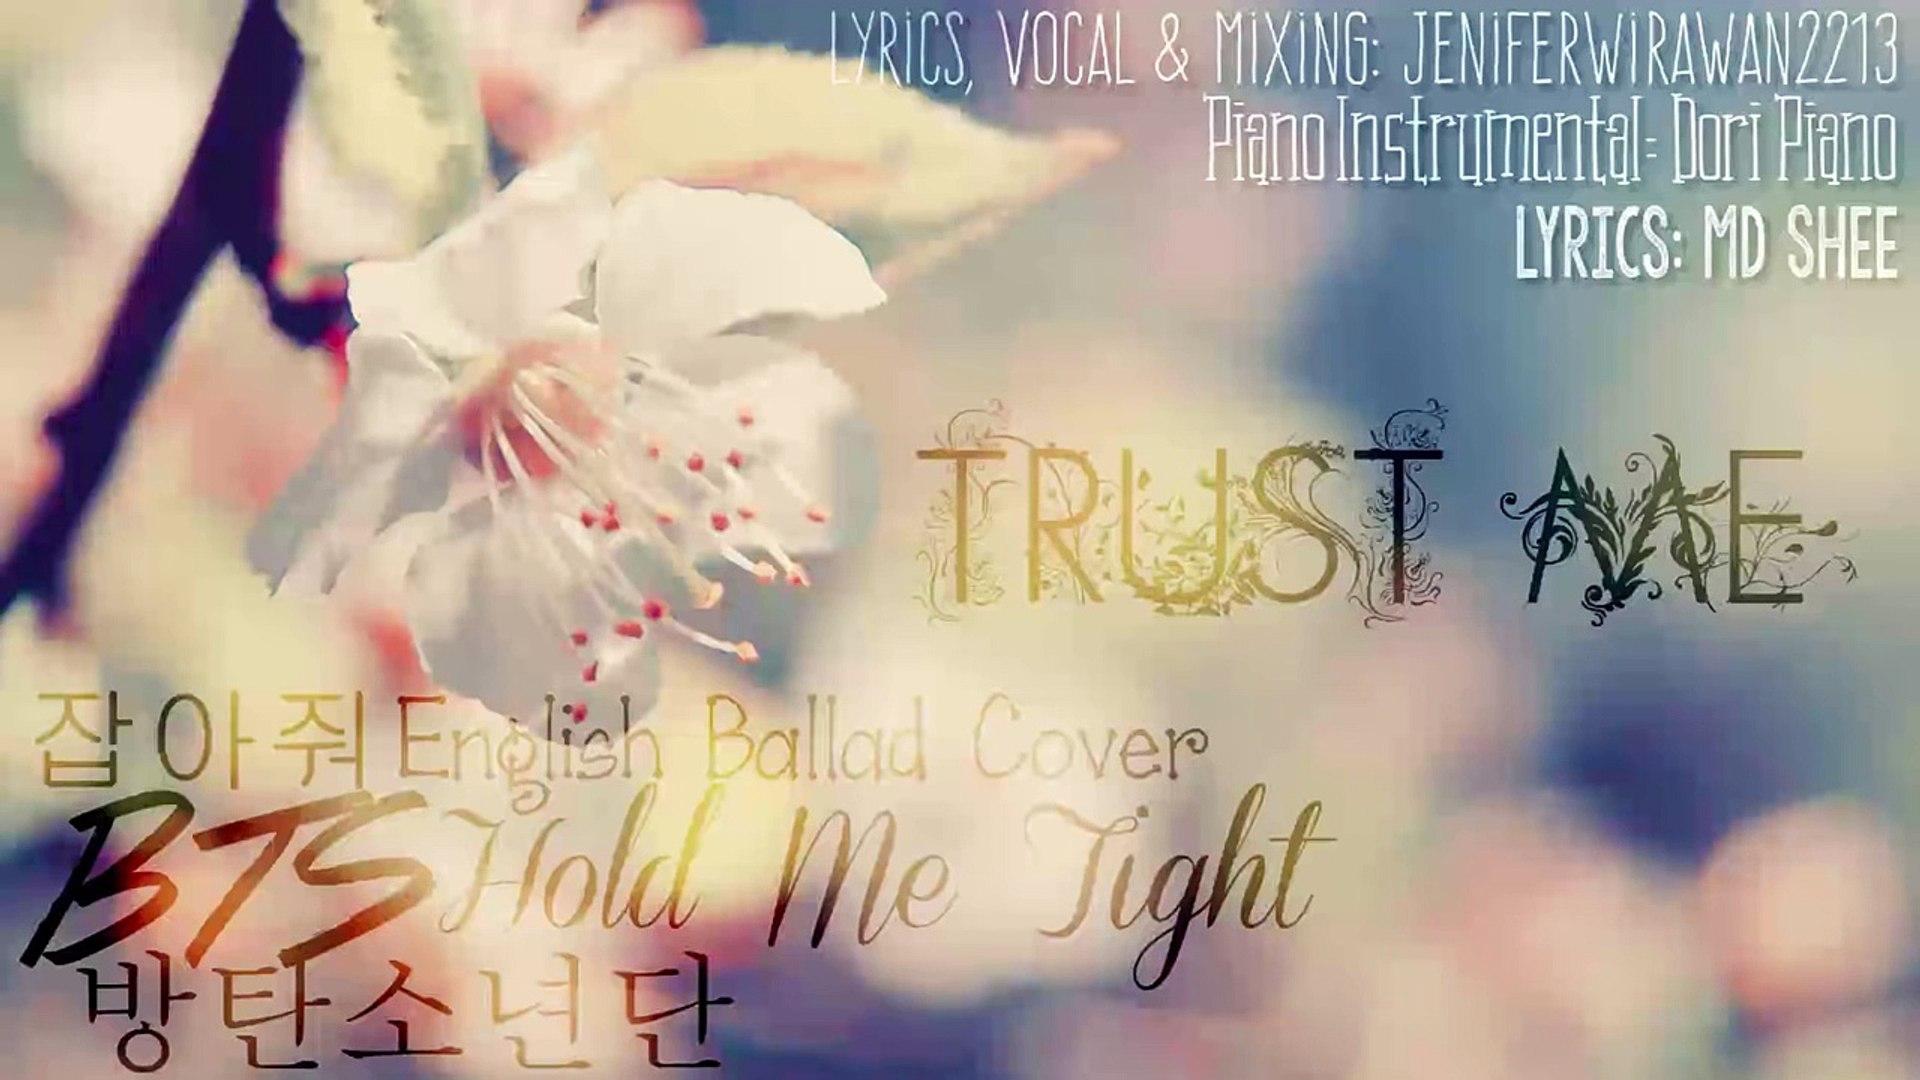 English Cover 방탄소년단 Bts 잡아줘 Hold Me Tight Ballad